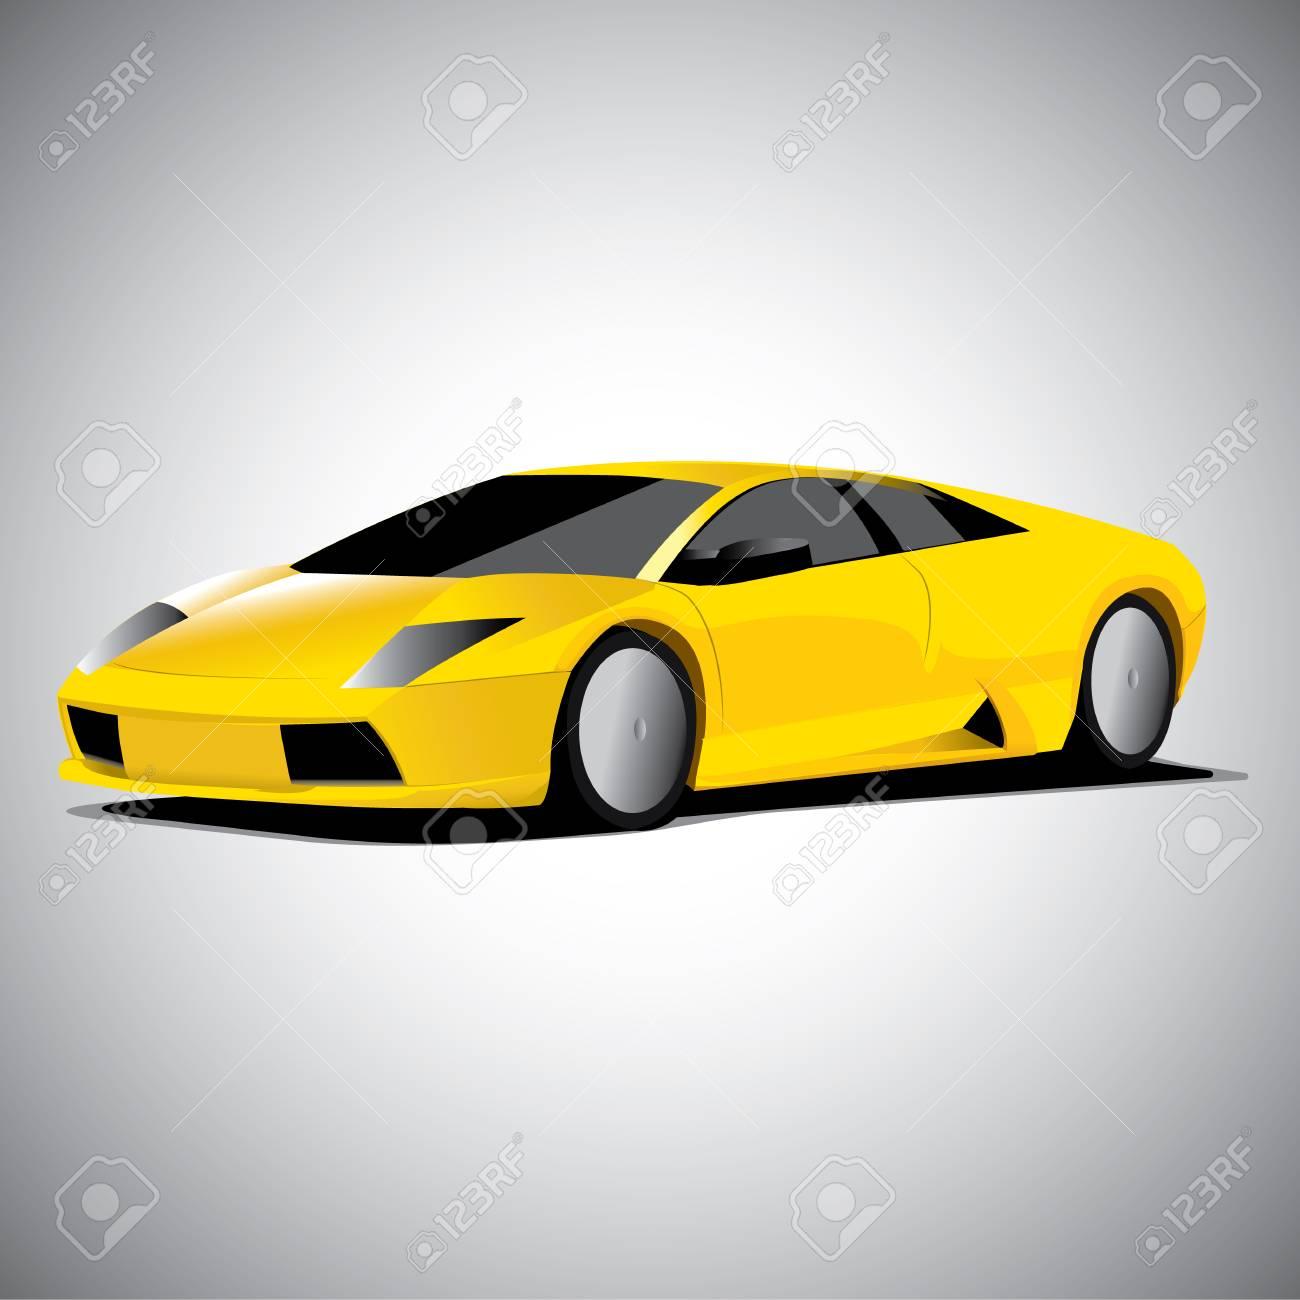 Realistic Car Vector Illustration Royalty Free Cliparts Vectors